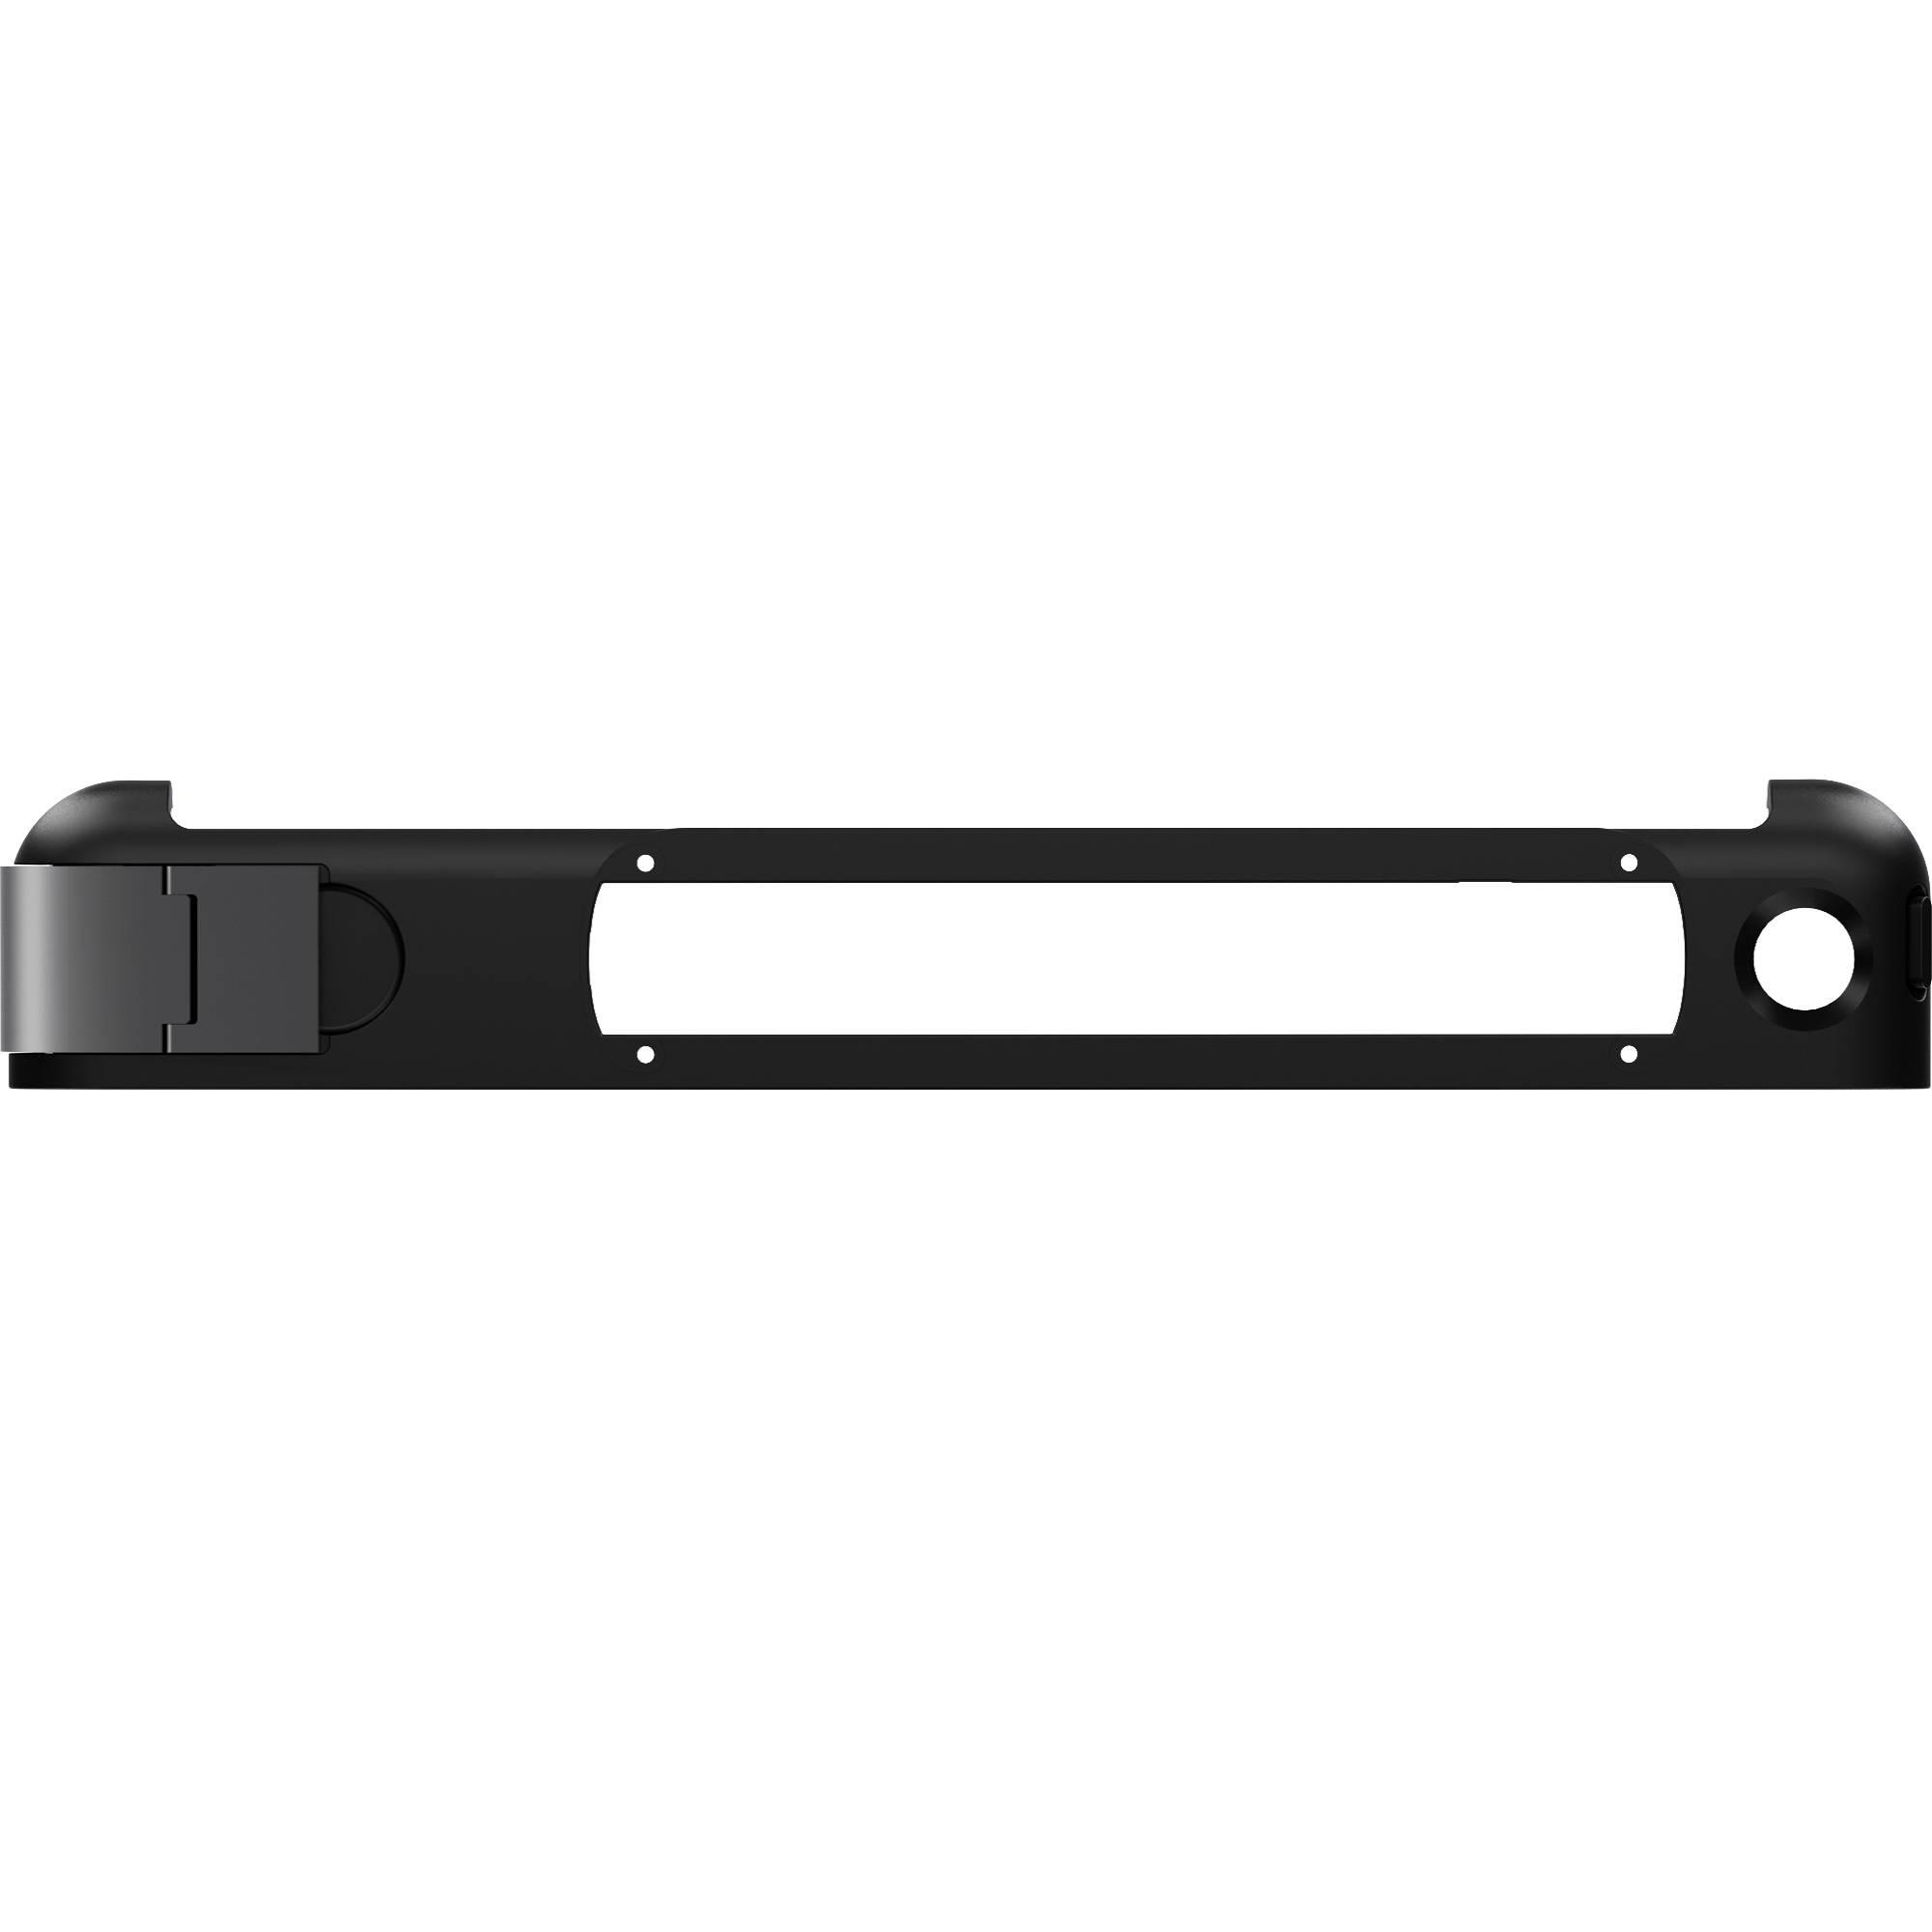 3d Systems Isense Bracket For Ipad Mini Retina 350425 B Amp H